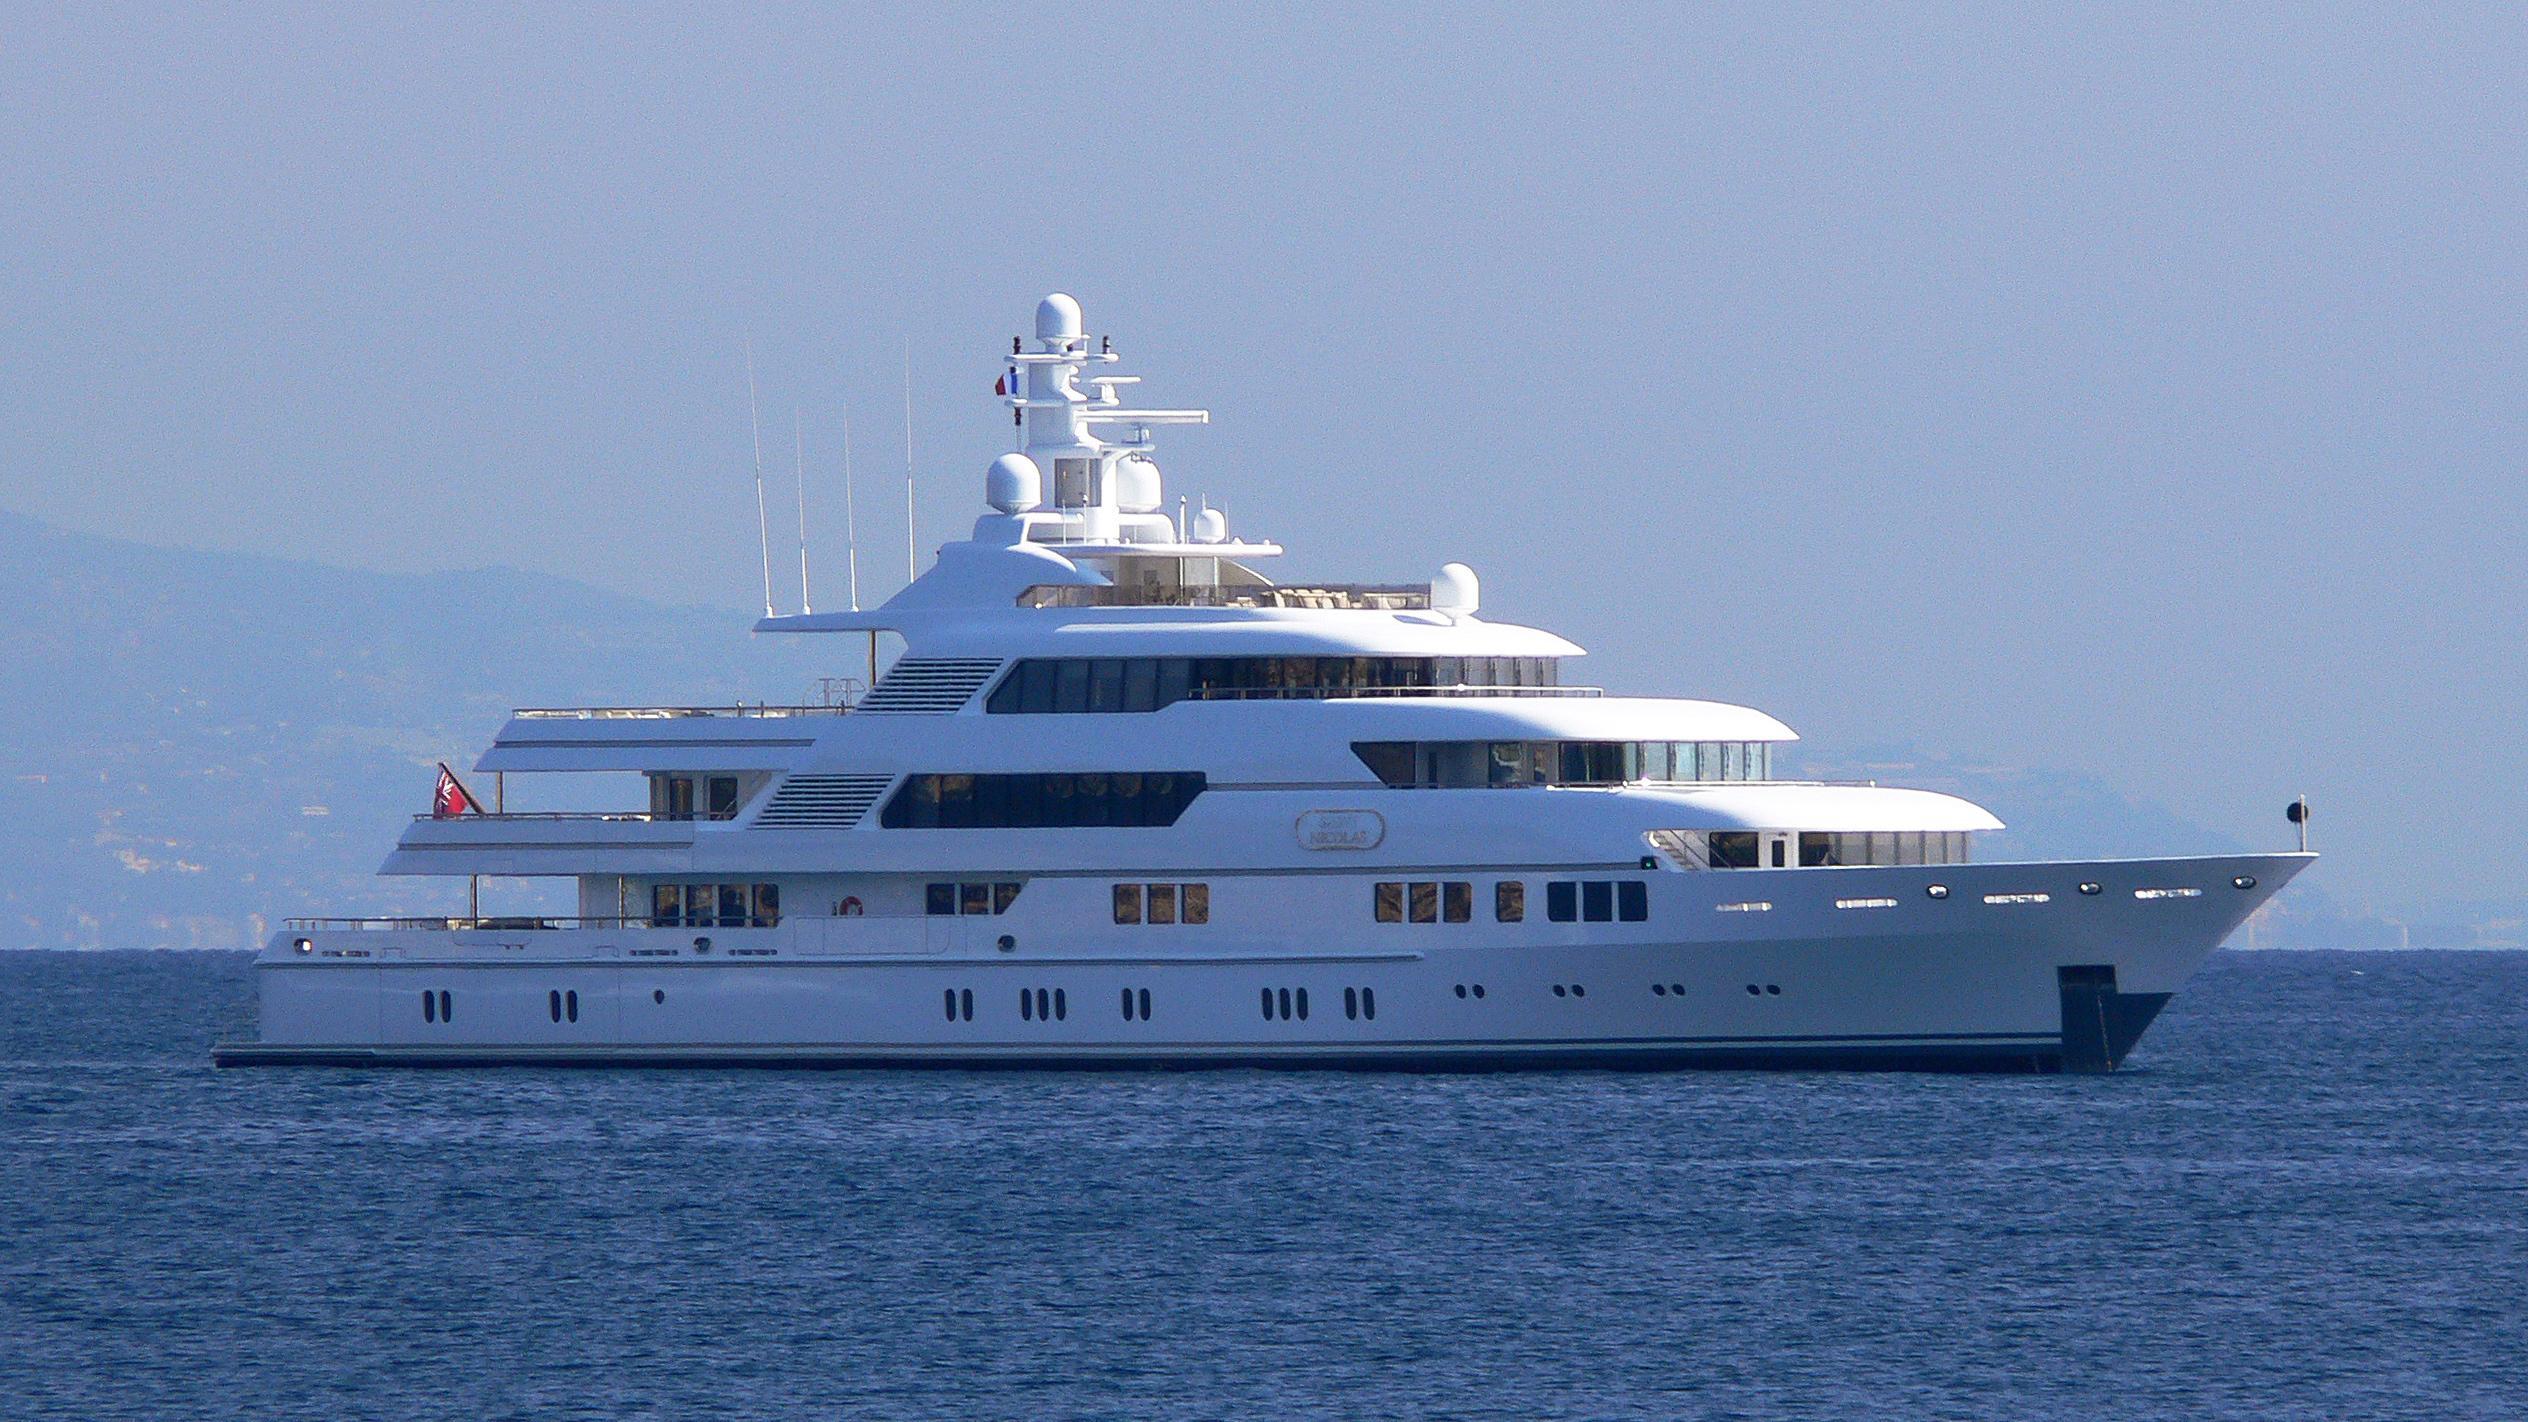 saint-nicolas-motor-yacht-lurssen-2007-70m-profile